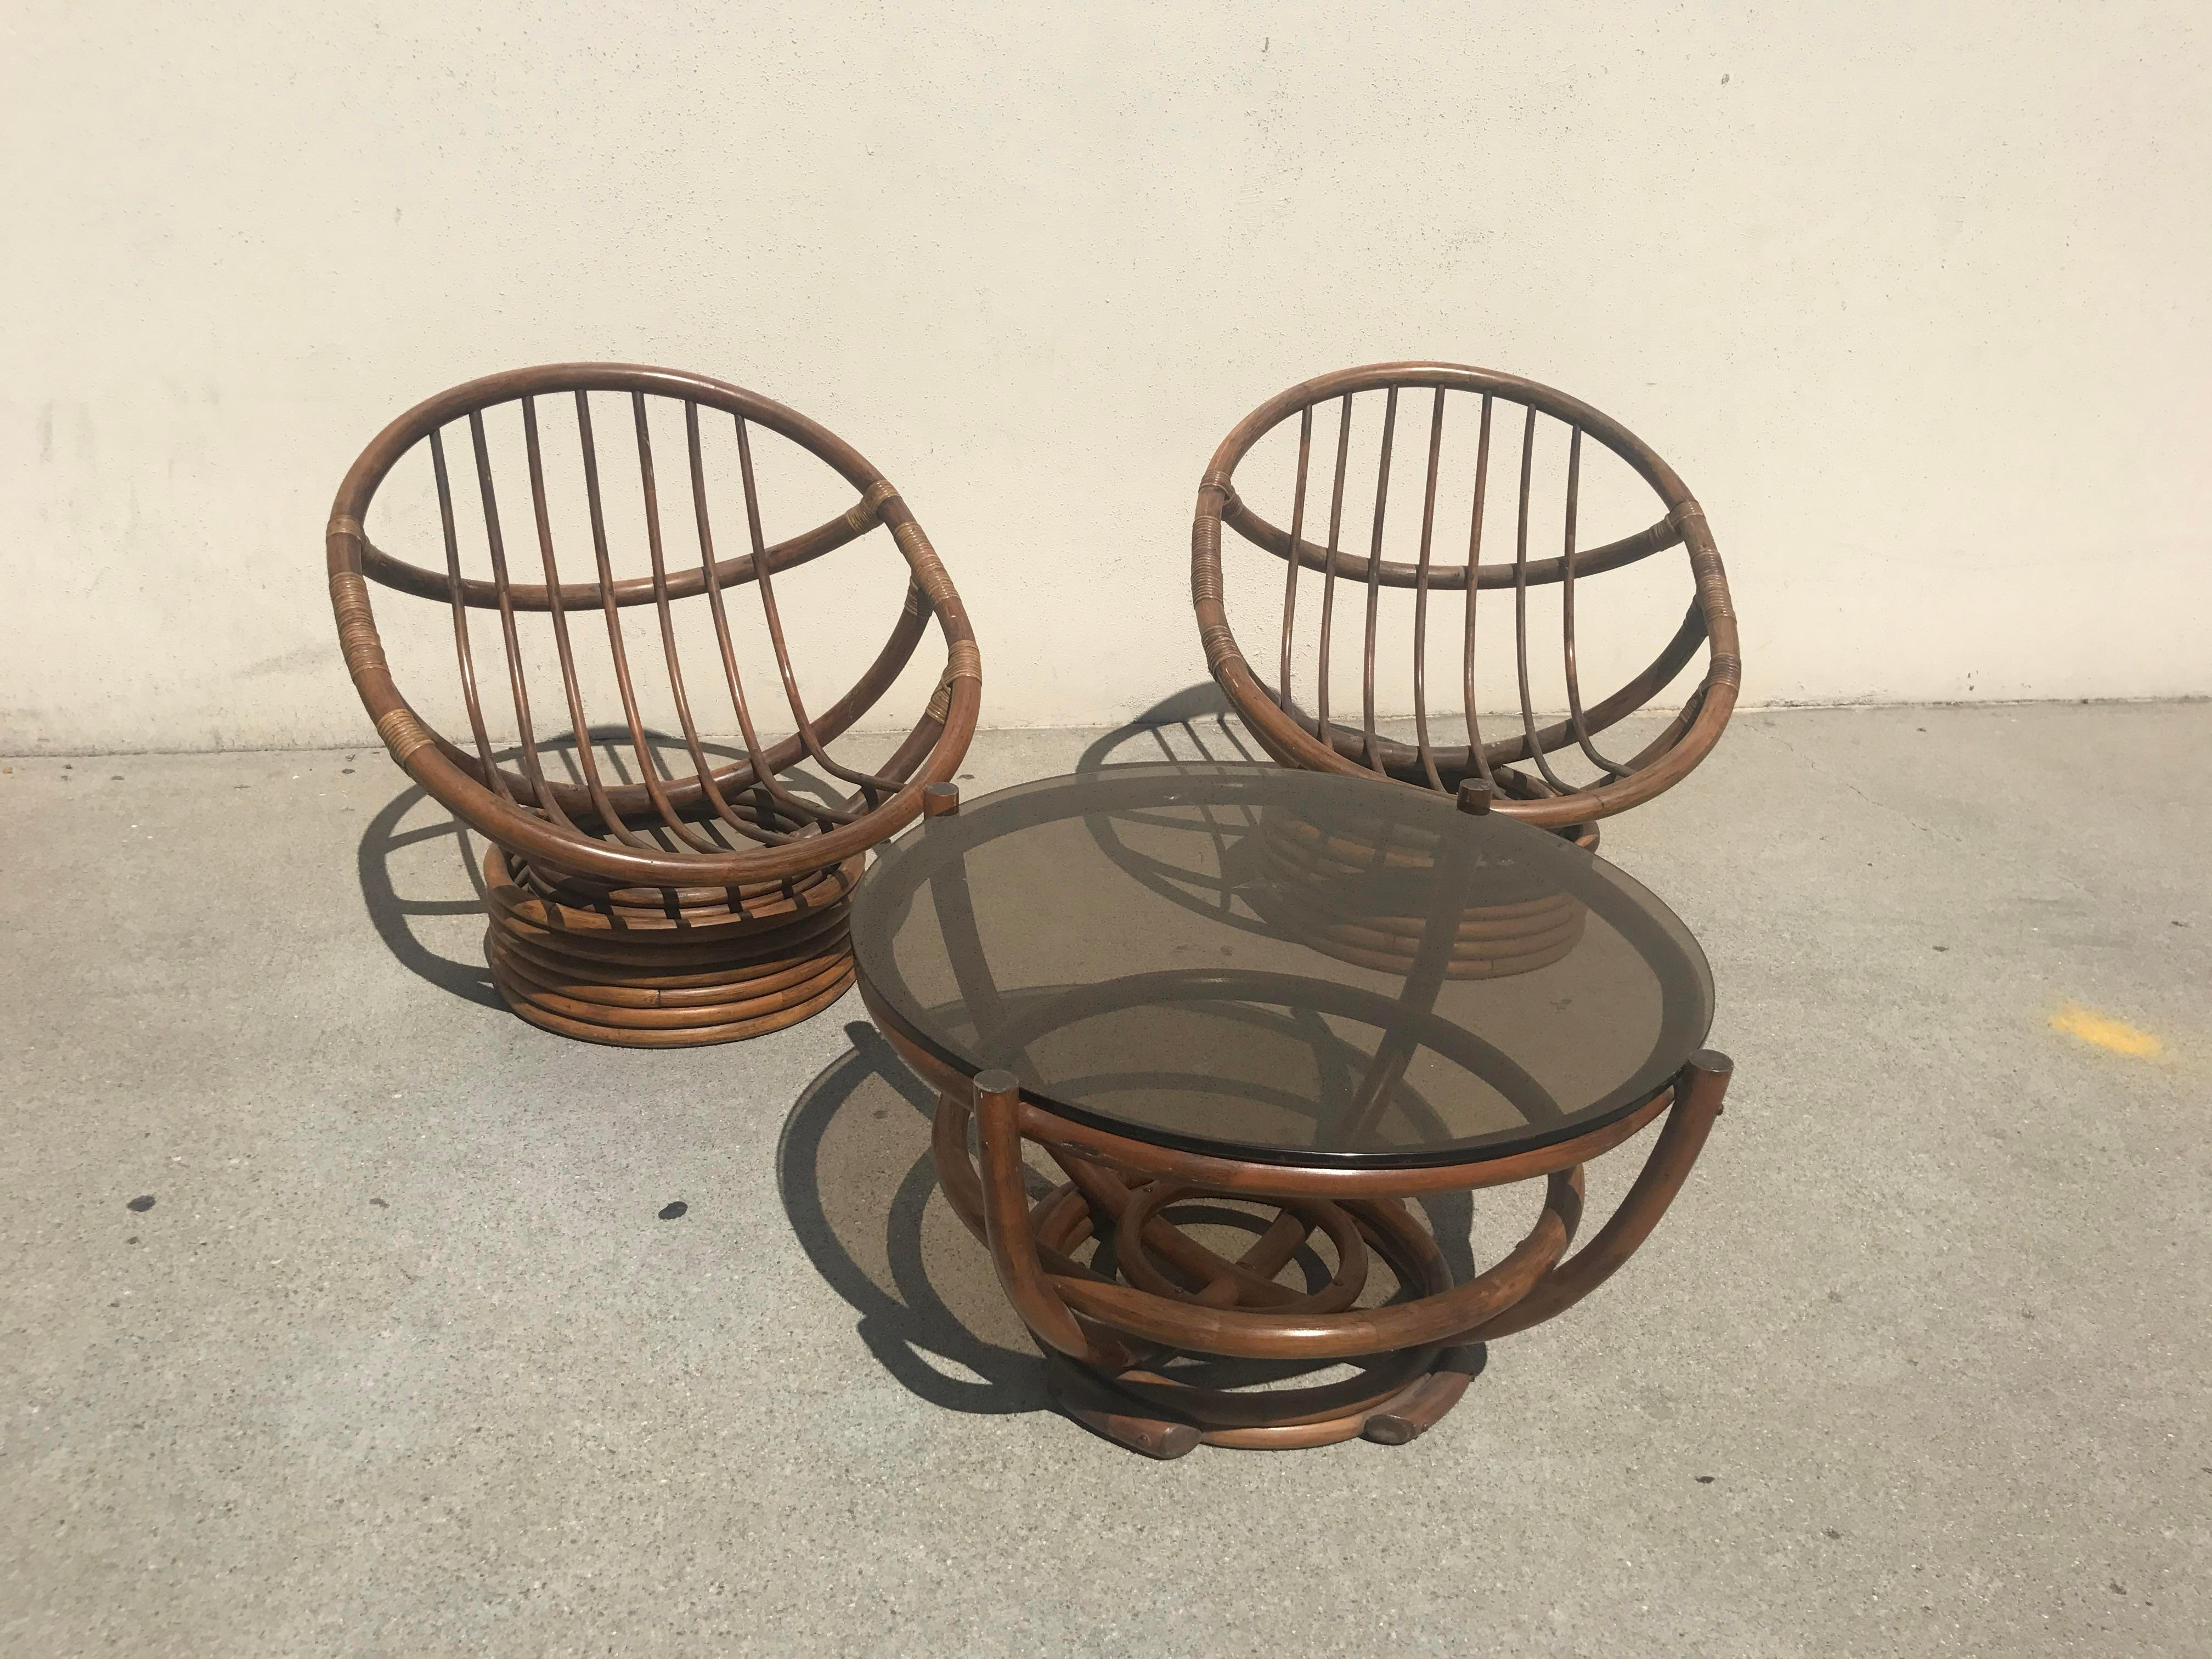 Vintage 60s Rattan Papasan Swivel Rocking Chairs U0026 Table   Set Of 3   Image  2